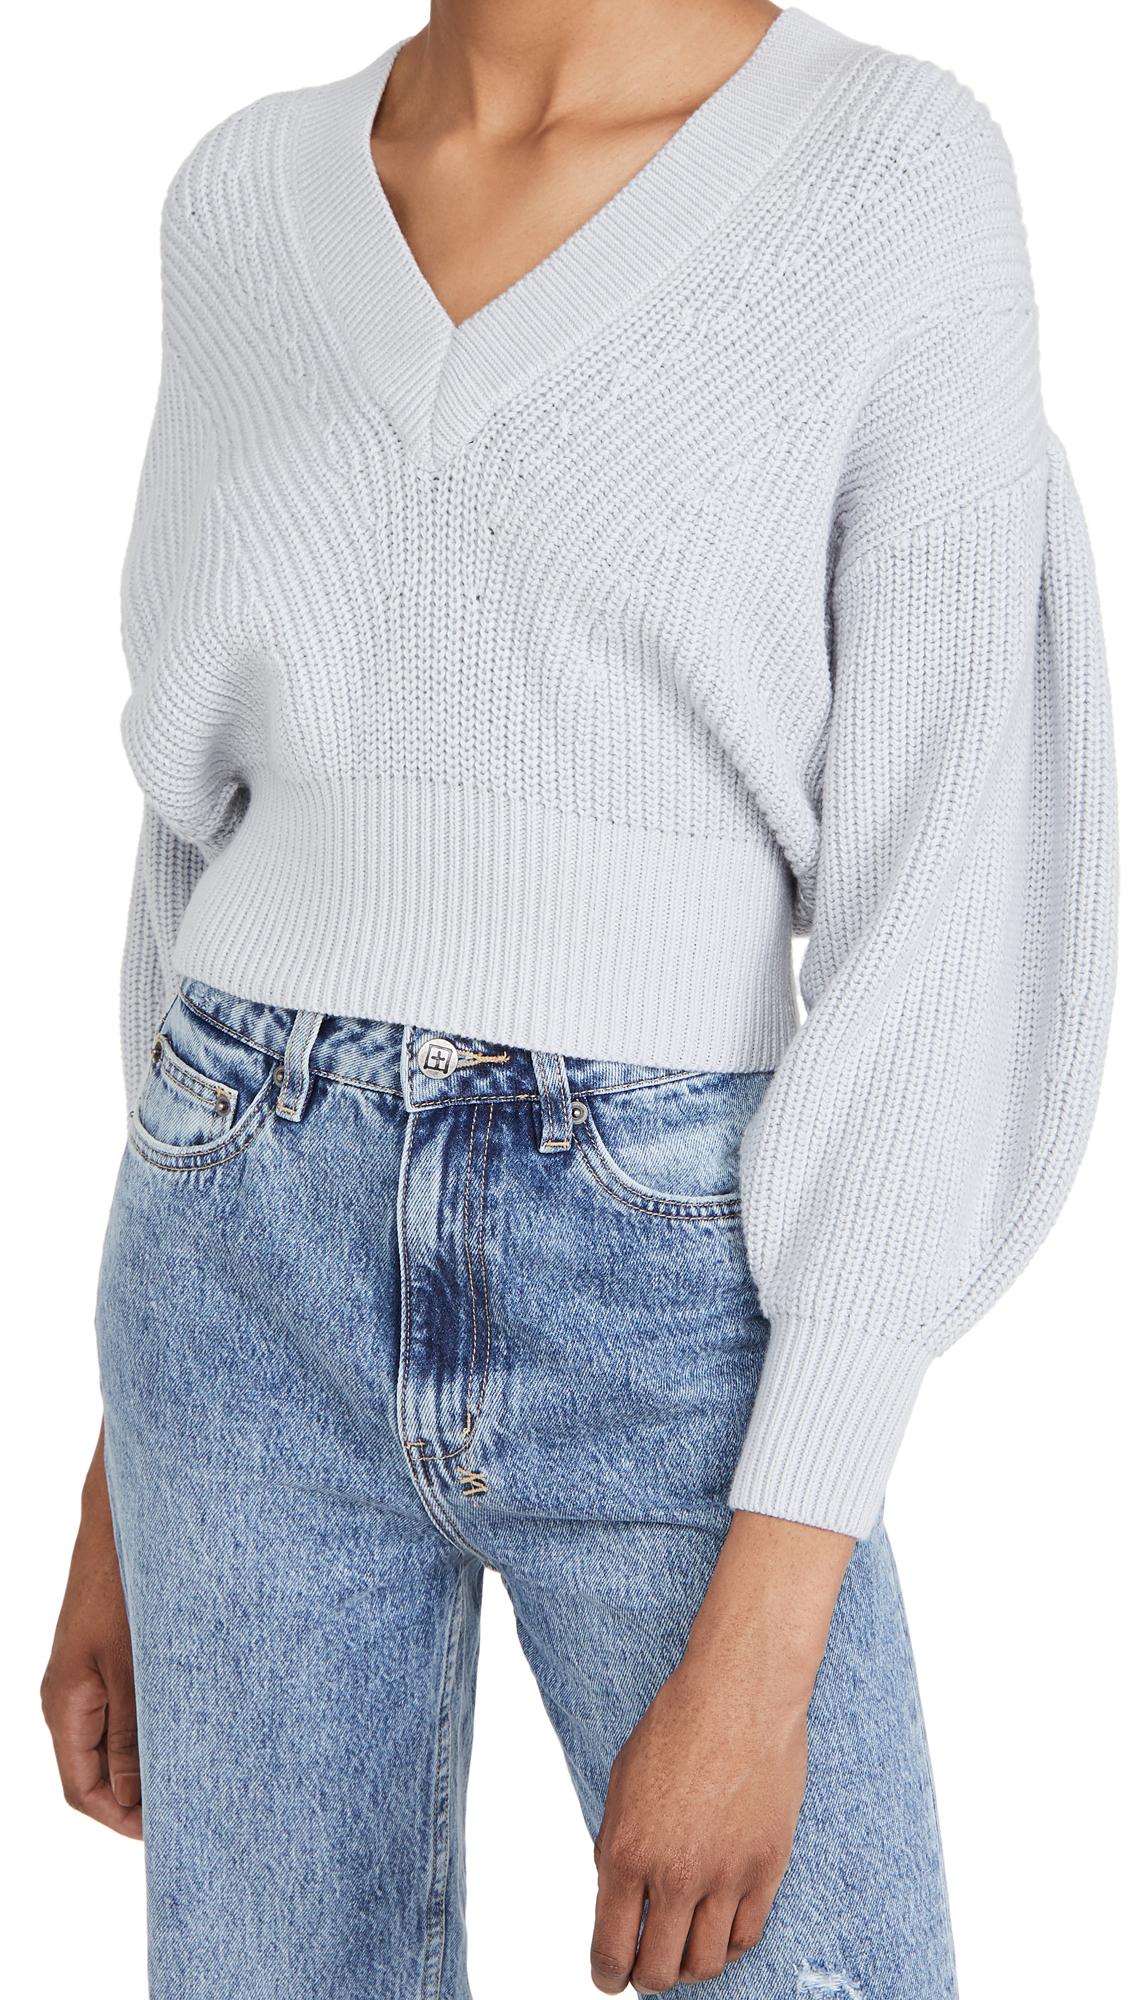 IRO Kiria Pullover Sweater